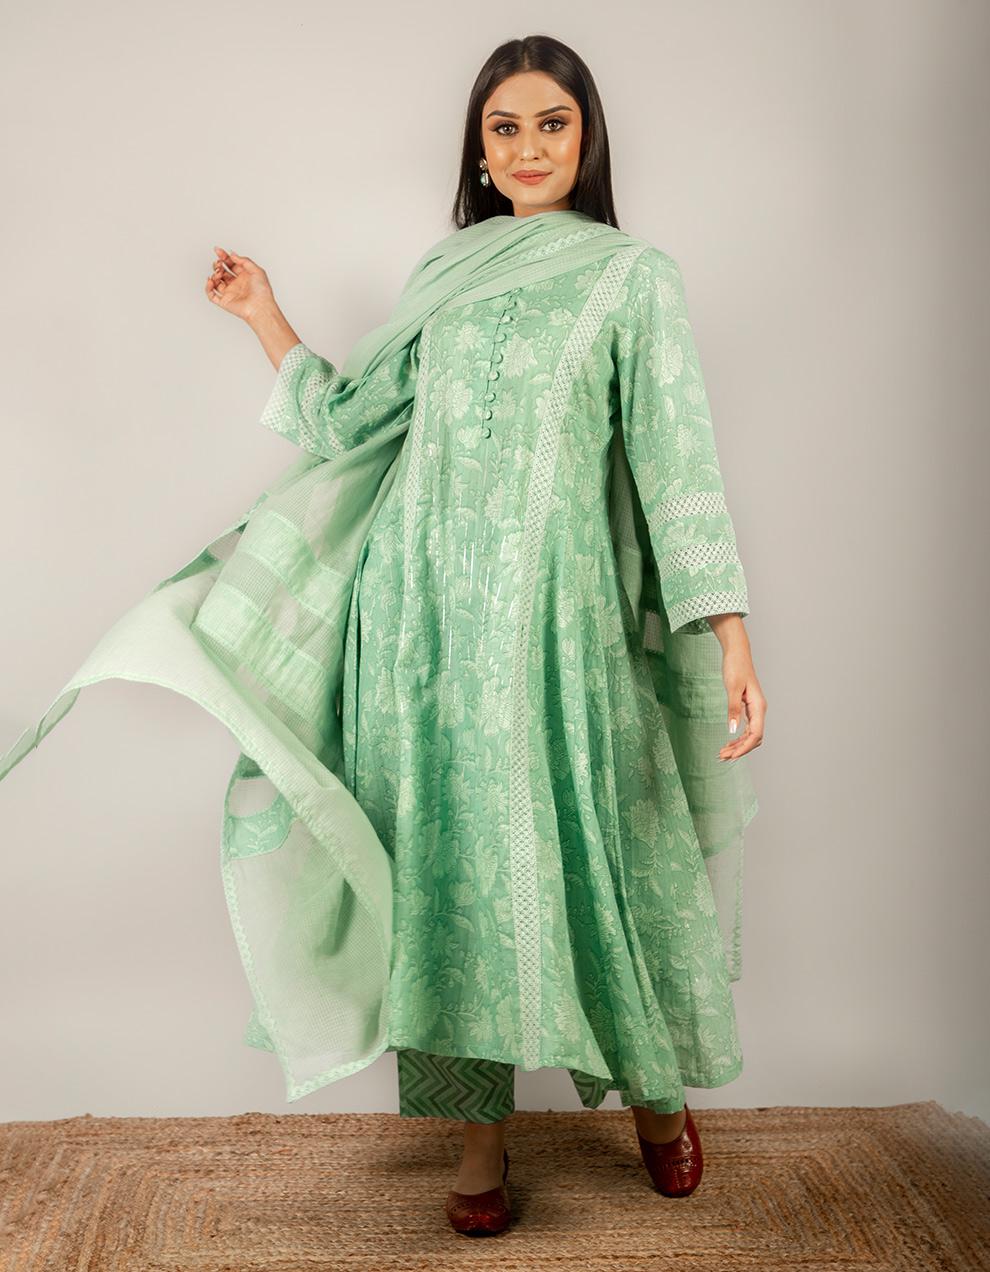 Festival Look cotton Dupatta Designs with Lace